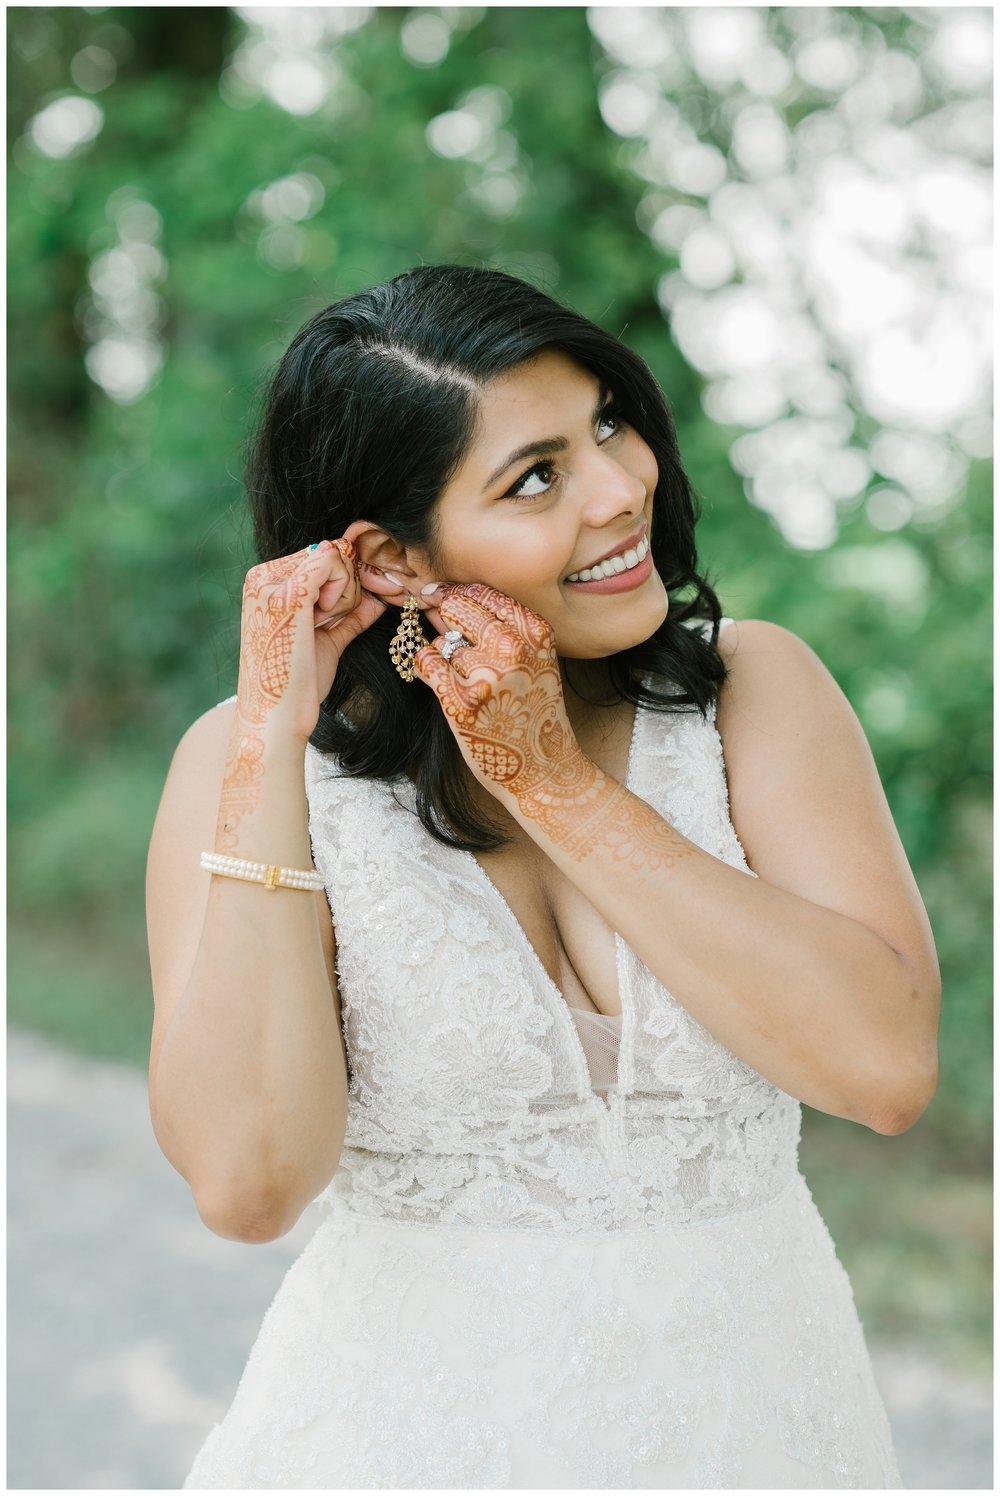 Rebecca_Bridges_Photography_Indianapolis_Wedding_Photographer_6925.jpg